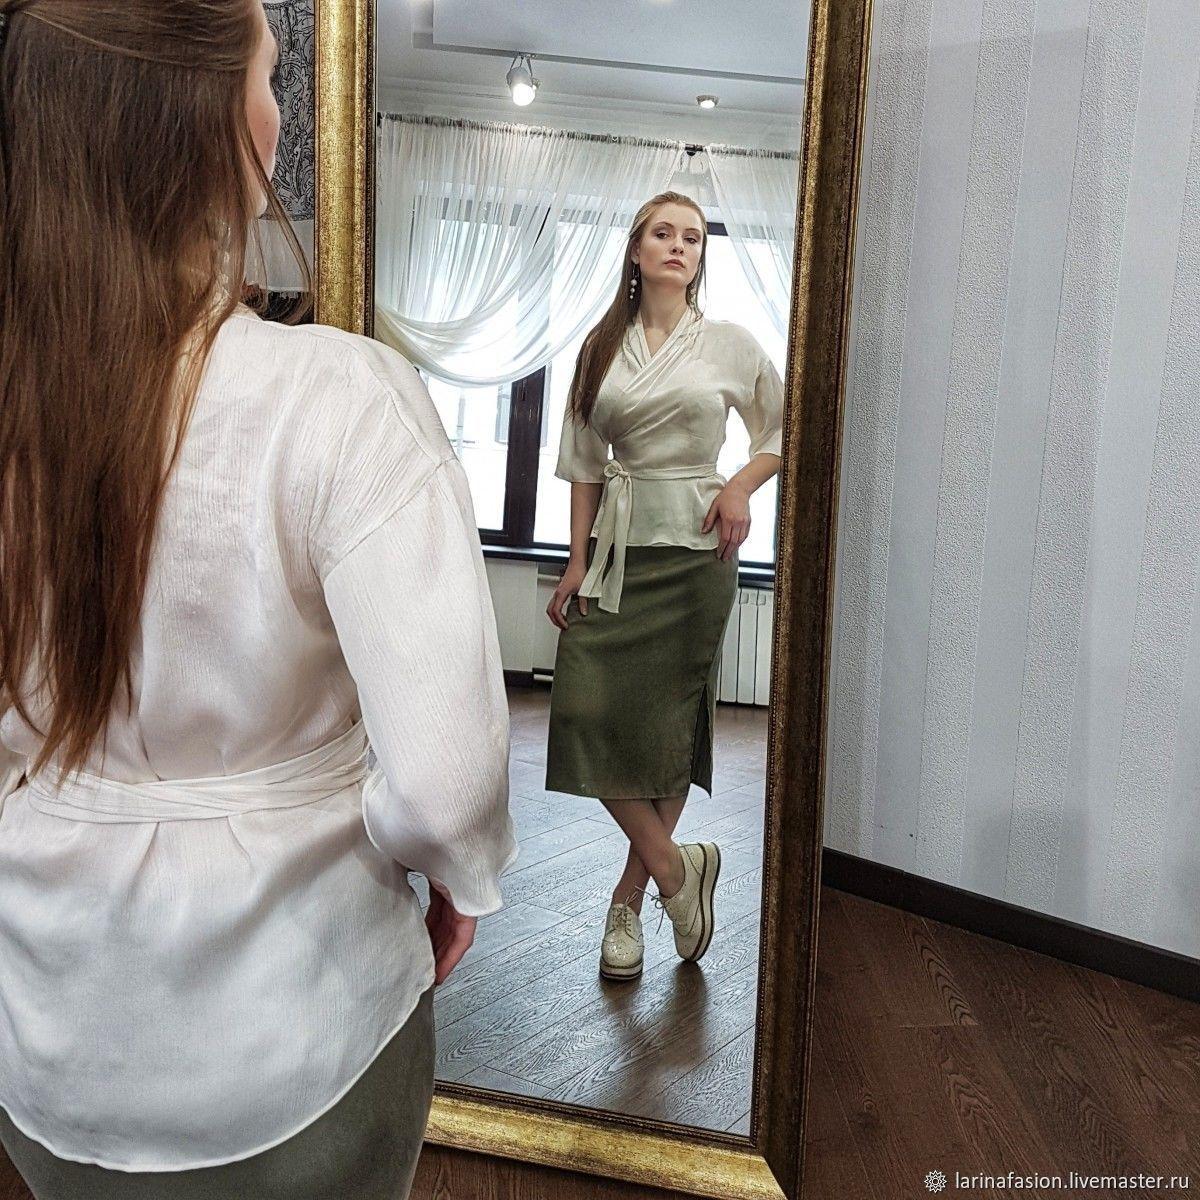 afa6e5478151 Шелковая белая блузка с запахом